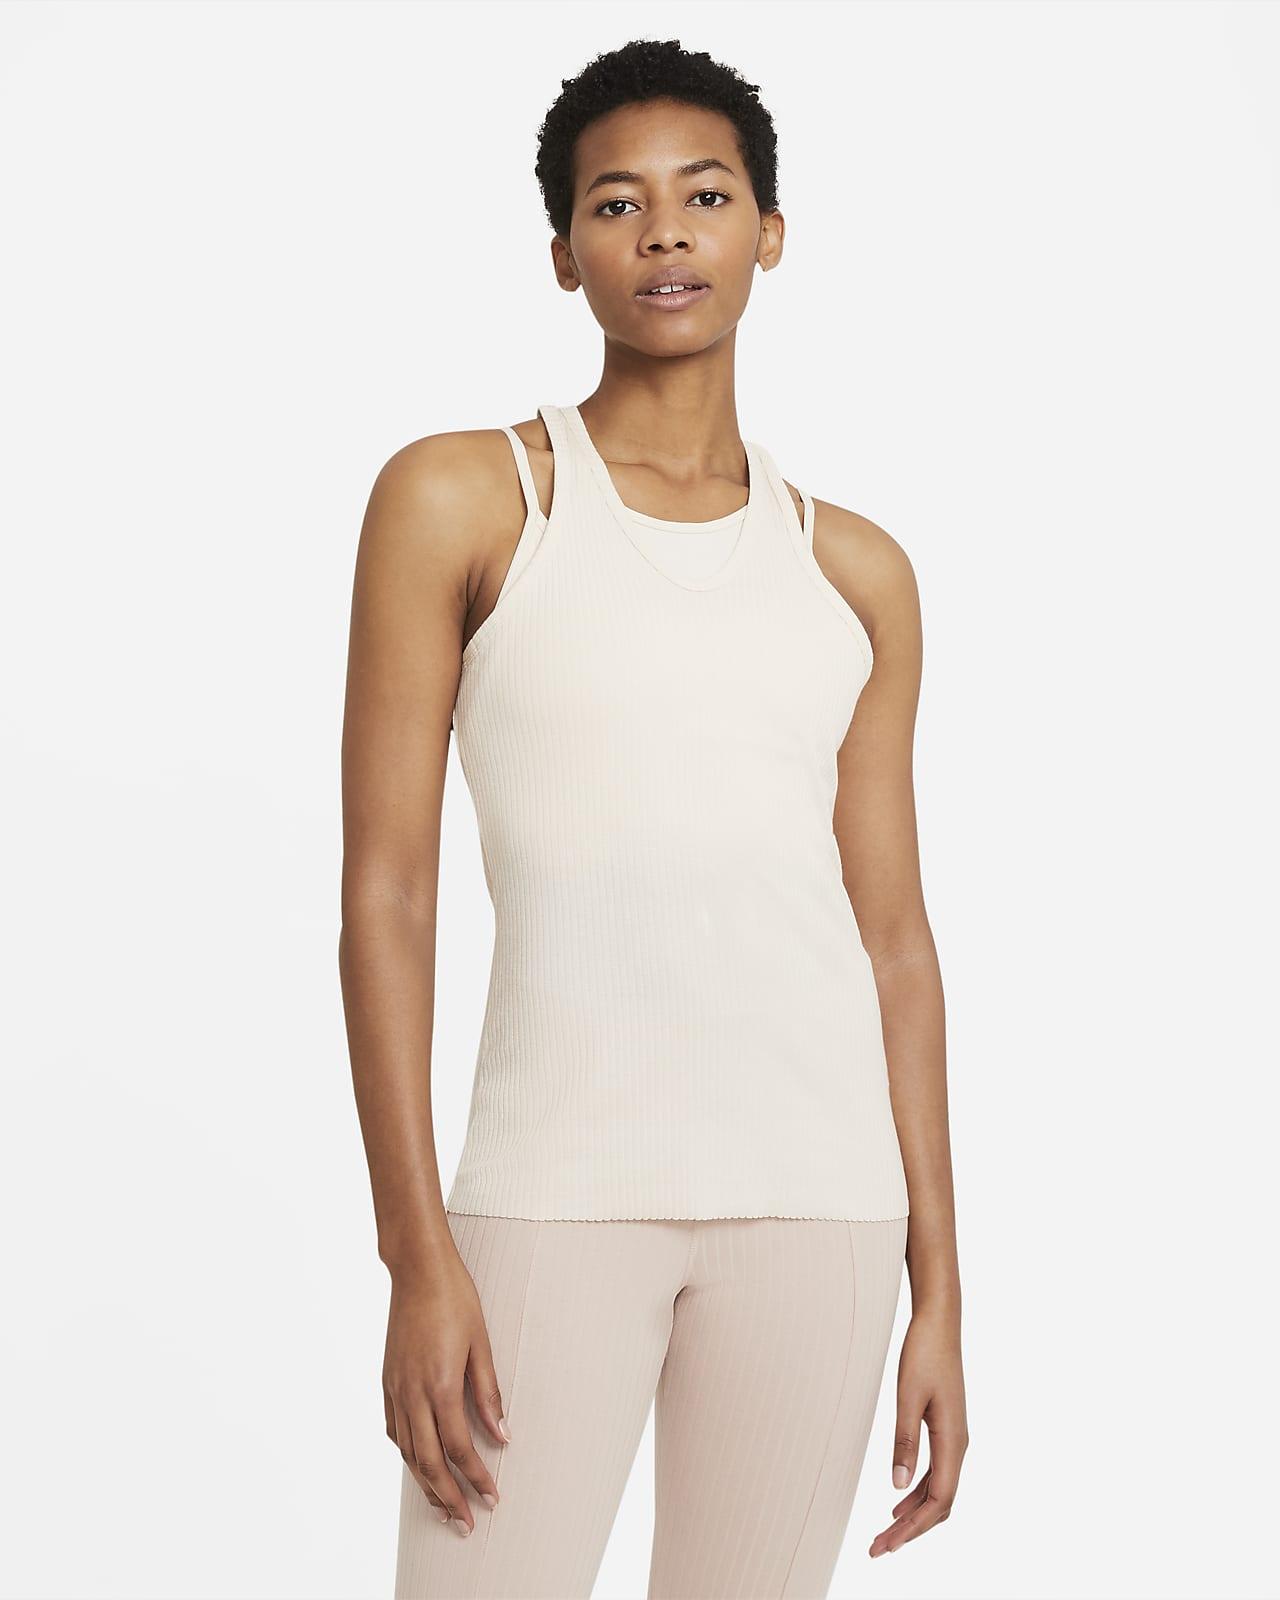 Nike Yoga Women's Ribbed Tank